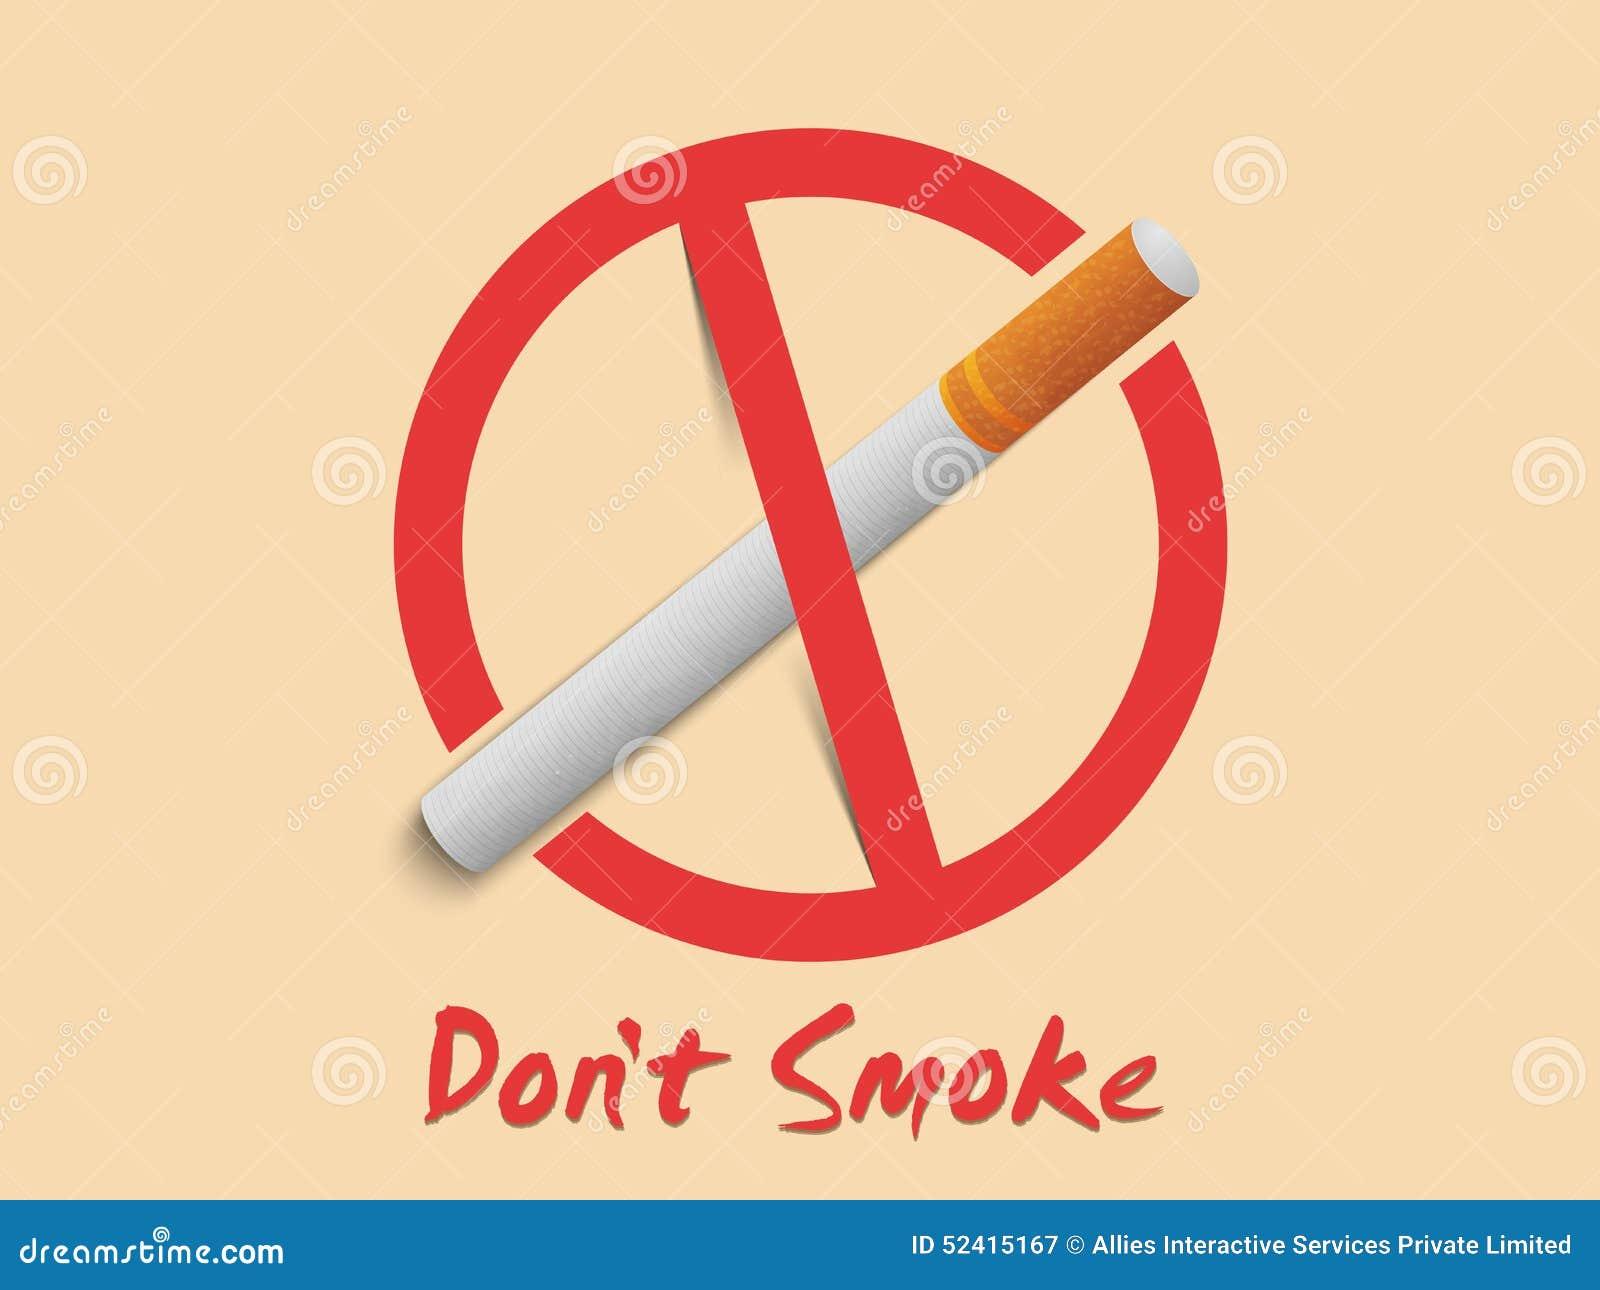 Anti smoking sign or symbol for no smoking day stock image anti smoking sign or symbol for no smoking day biocorpaavc Choice Image